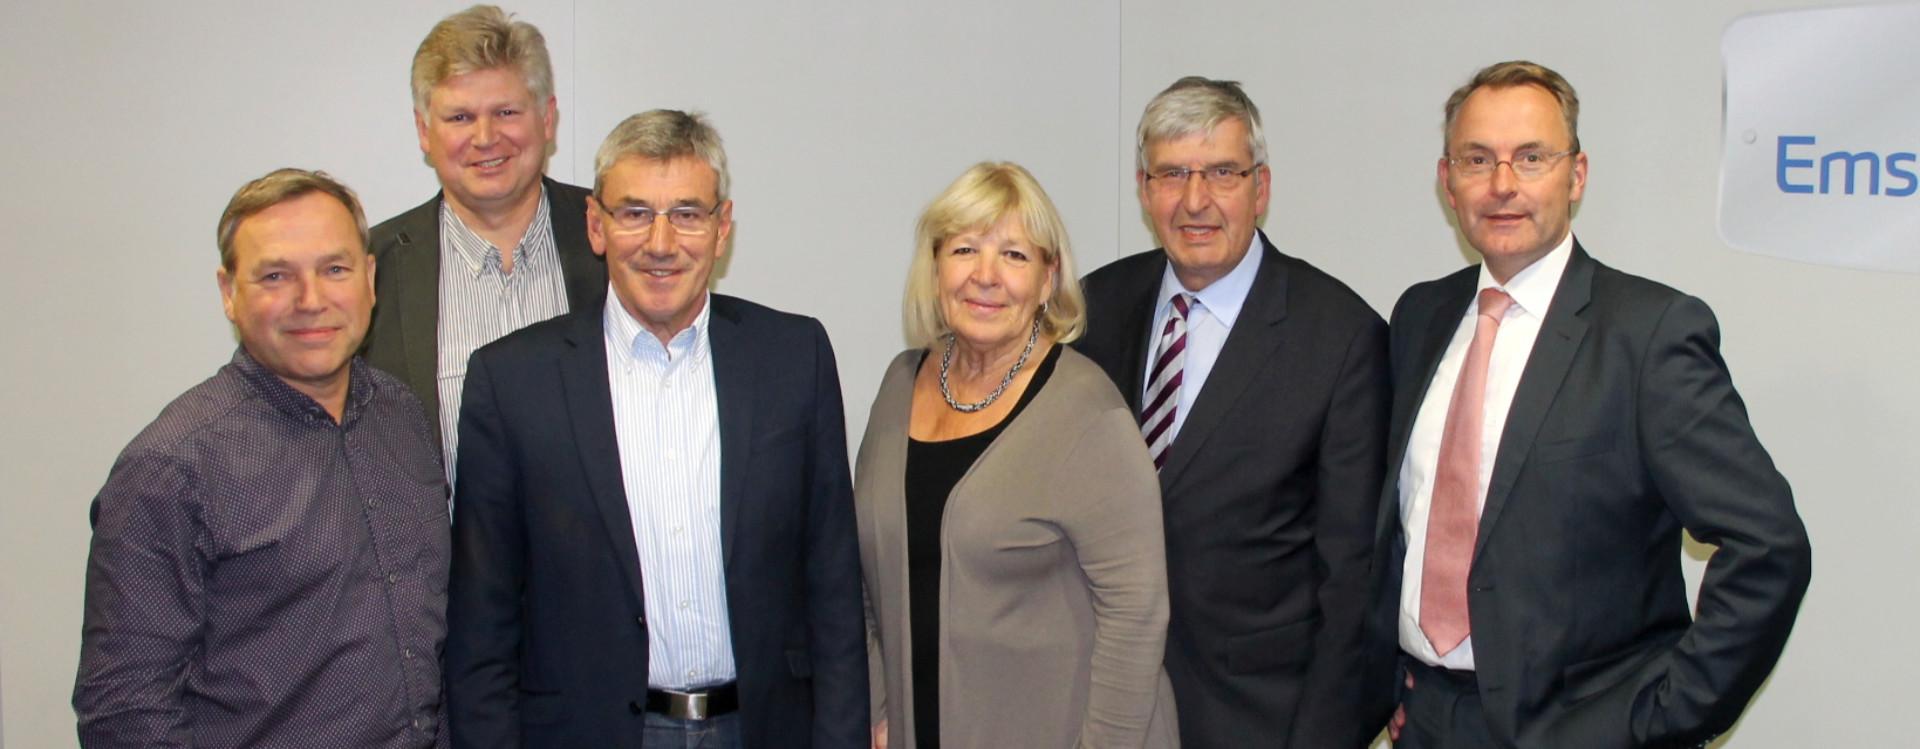 Fraktionsvorstand_CDU-Kreistagsfraktion_2016_Slider